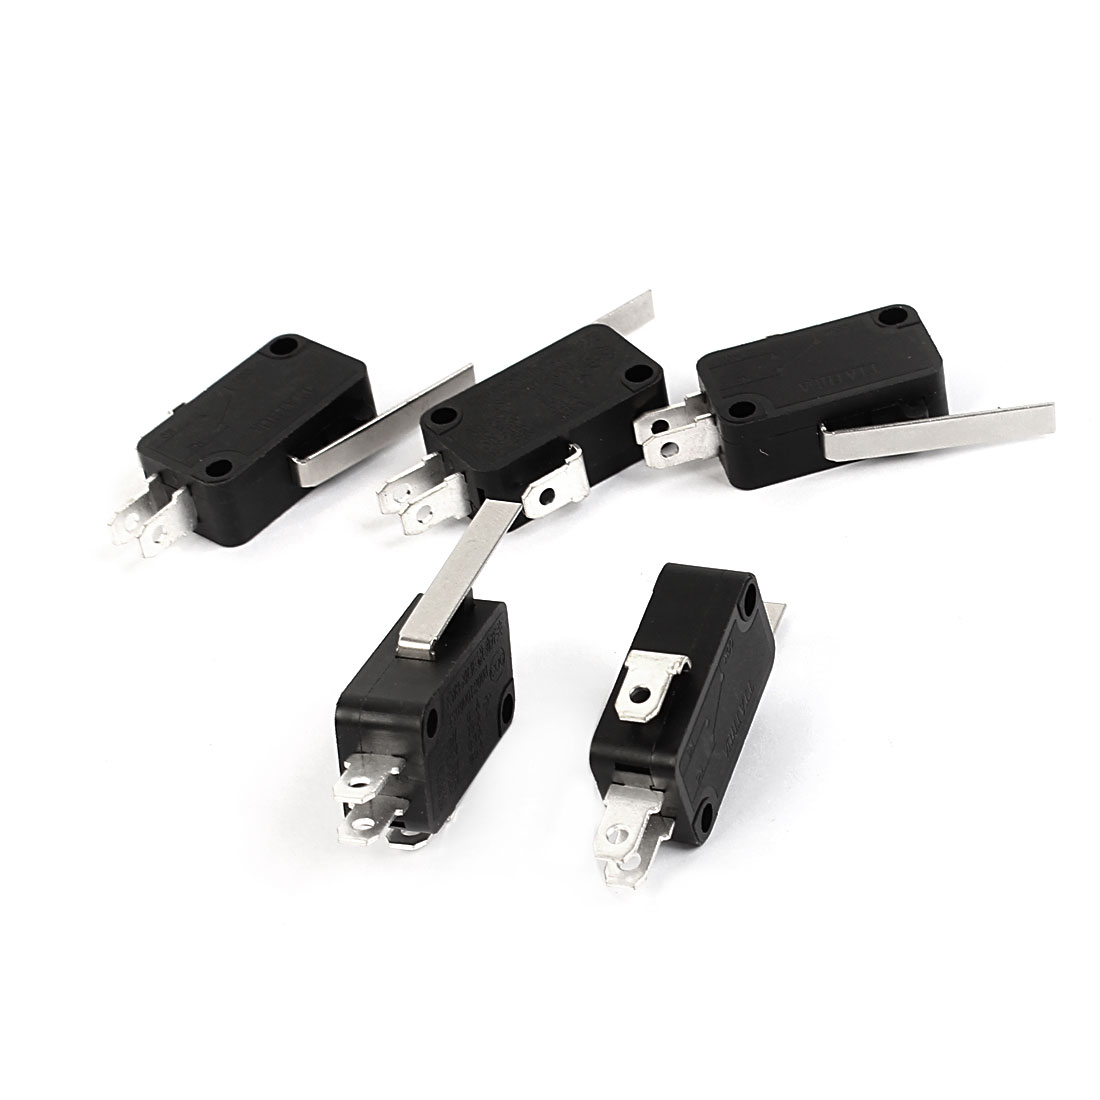 5pcs SPDT 1NO 1NC 1 Com Long Hinge Lever Actuator Micro Switch